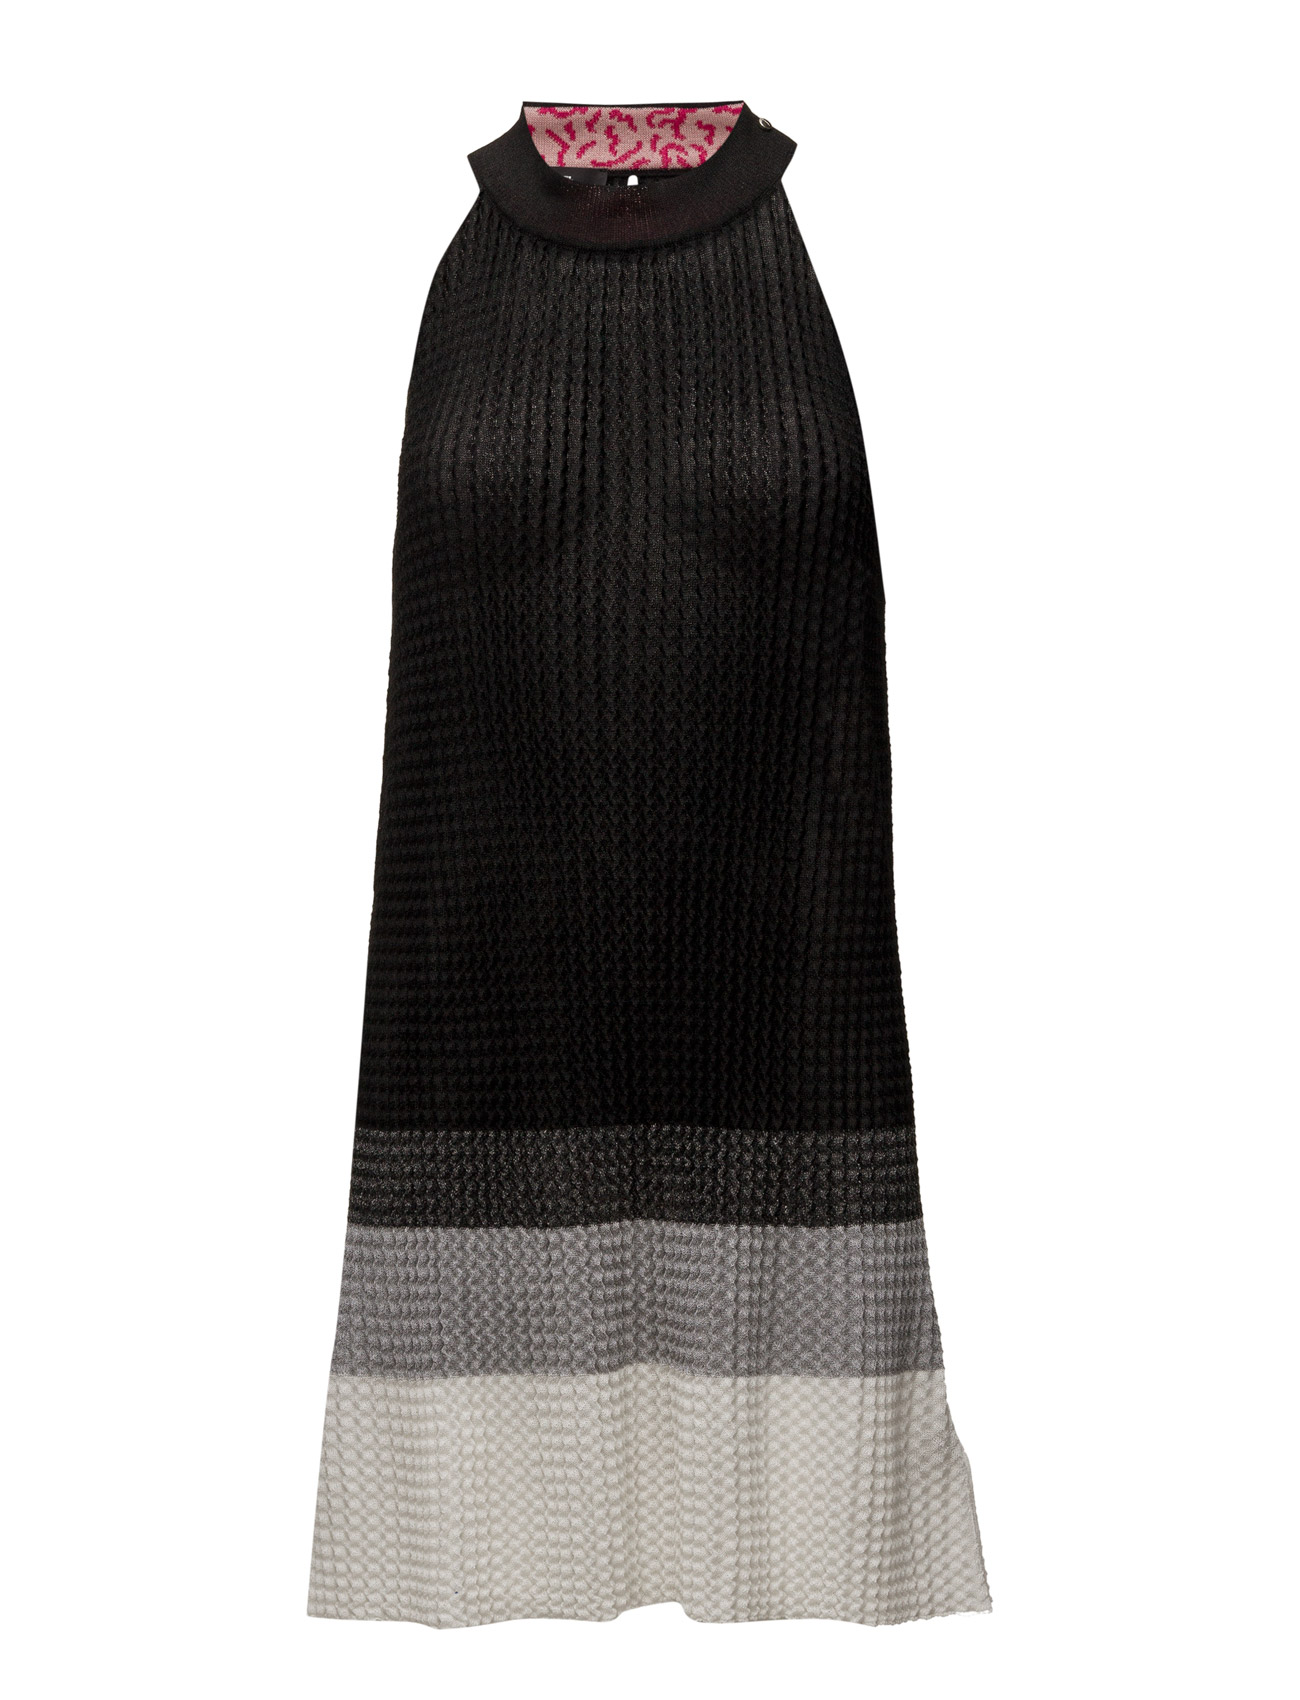 M-South Dress Diesel Women Kjoler til Kvinder i Sort